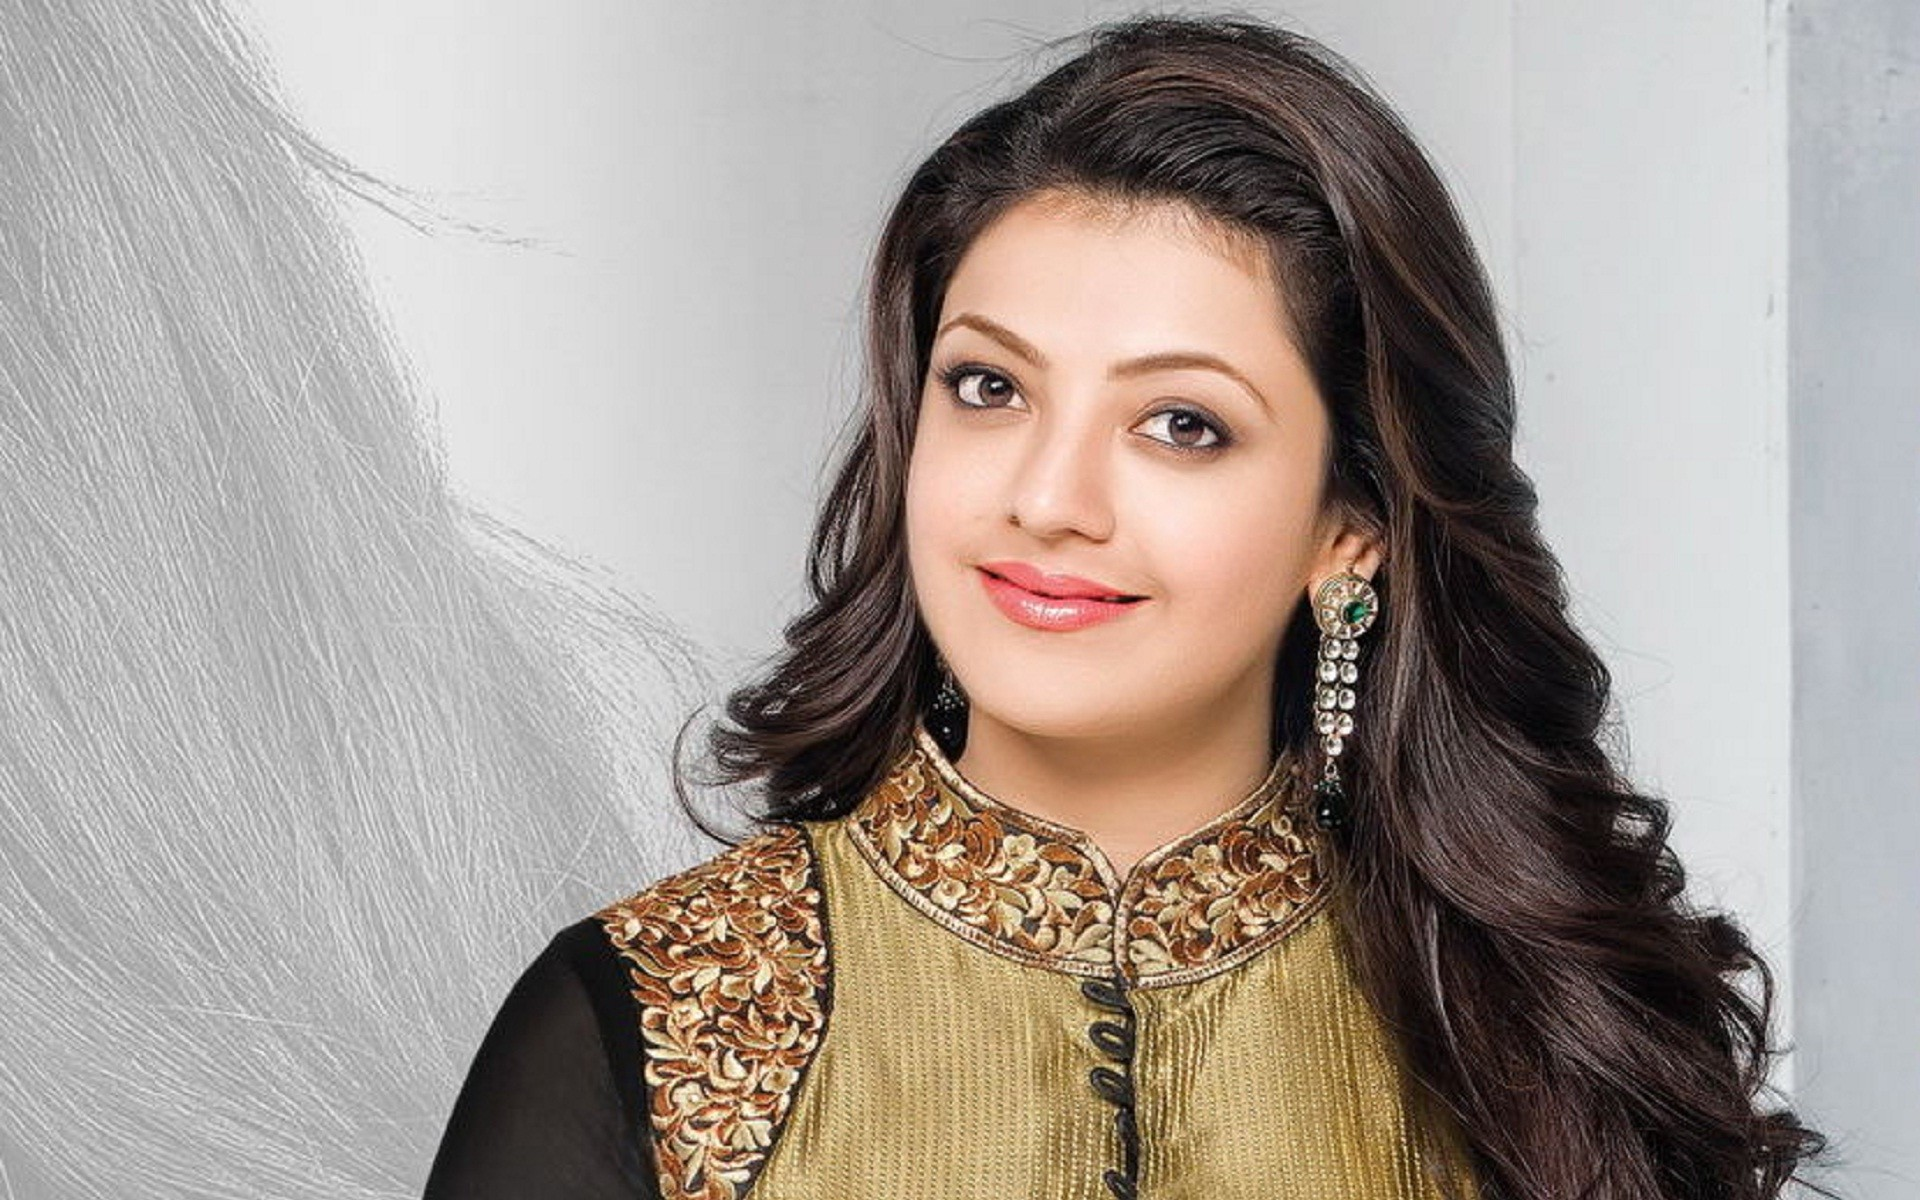 South Indian Girls HD Desktop Backgrounds